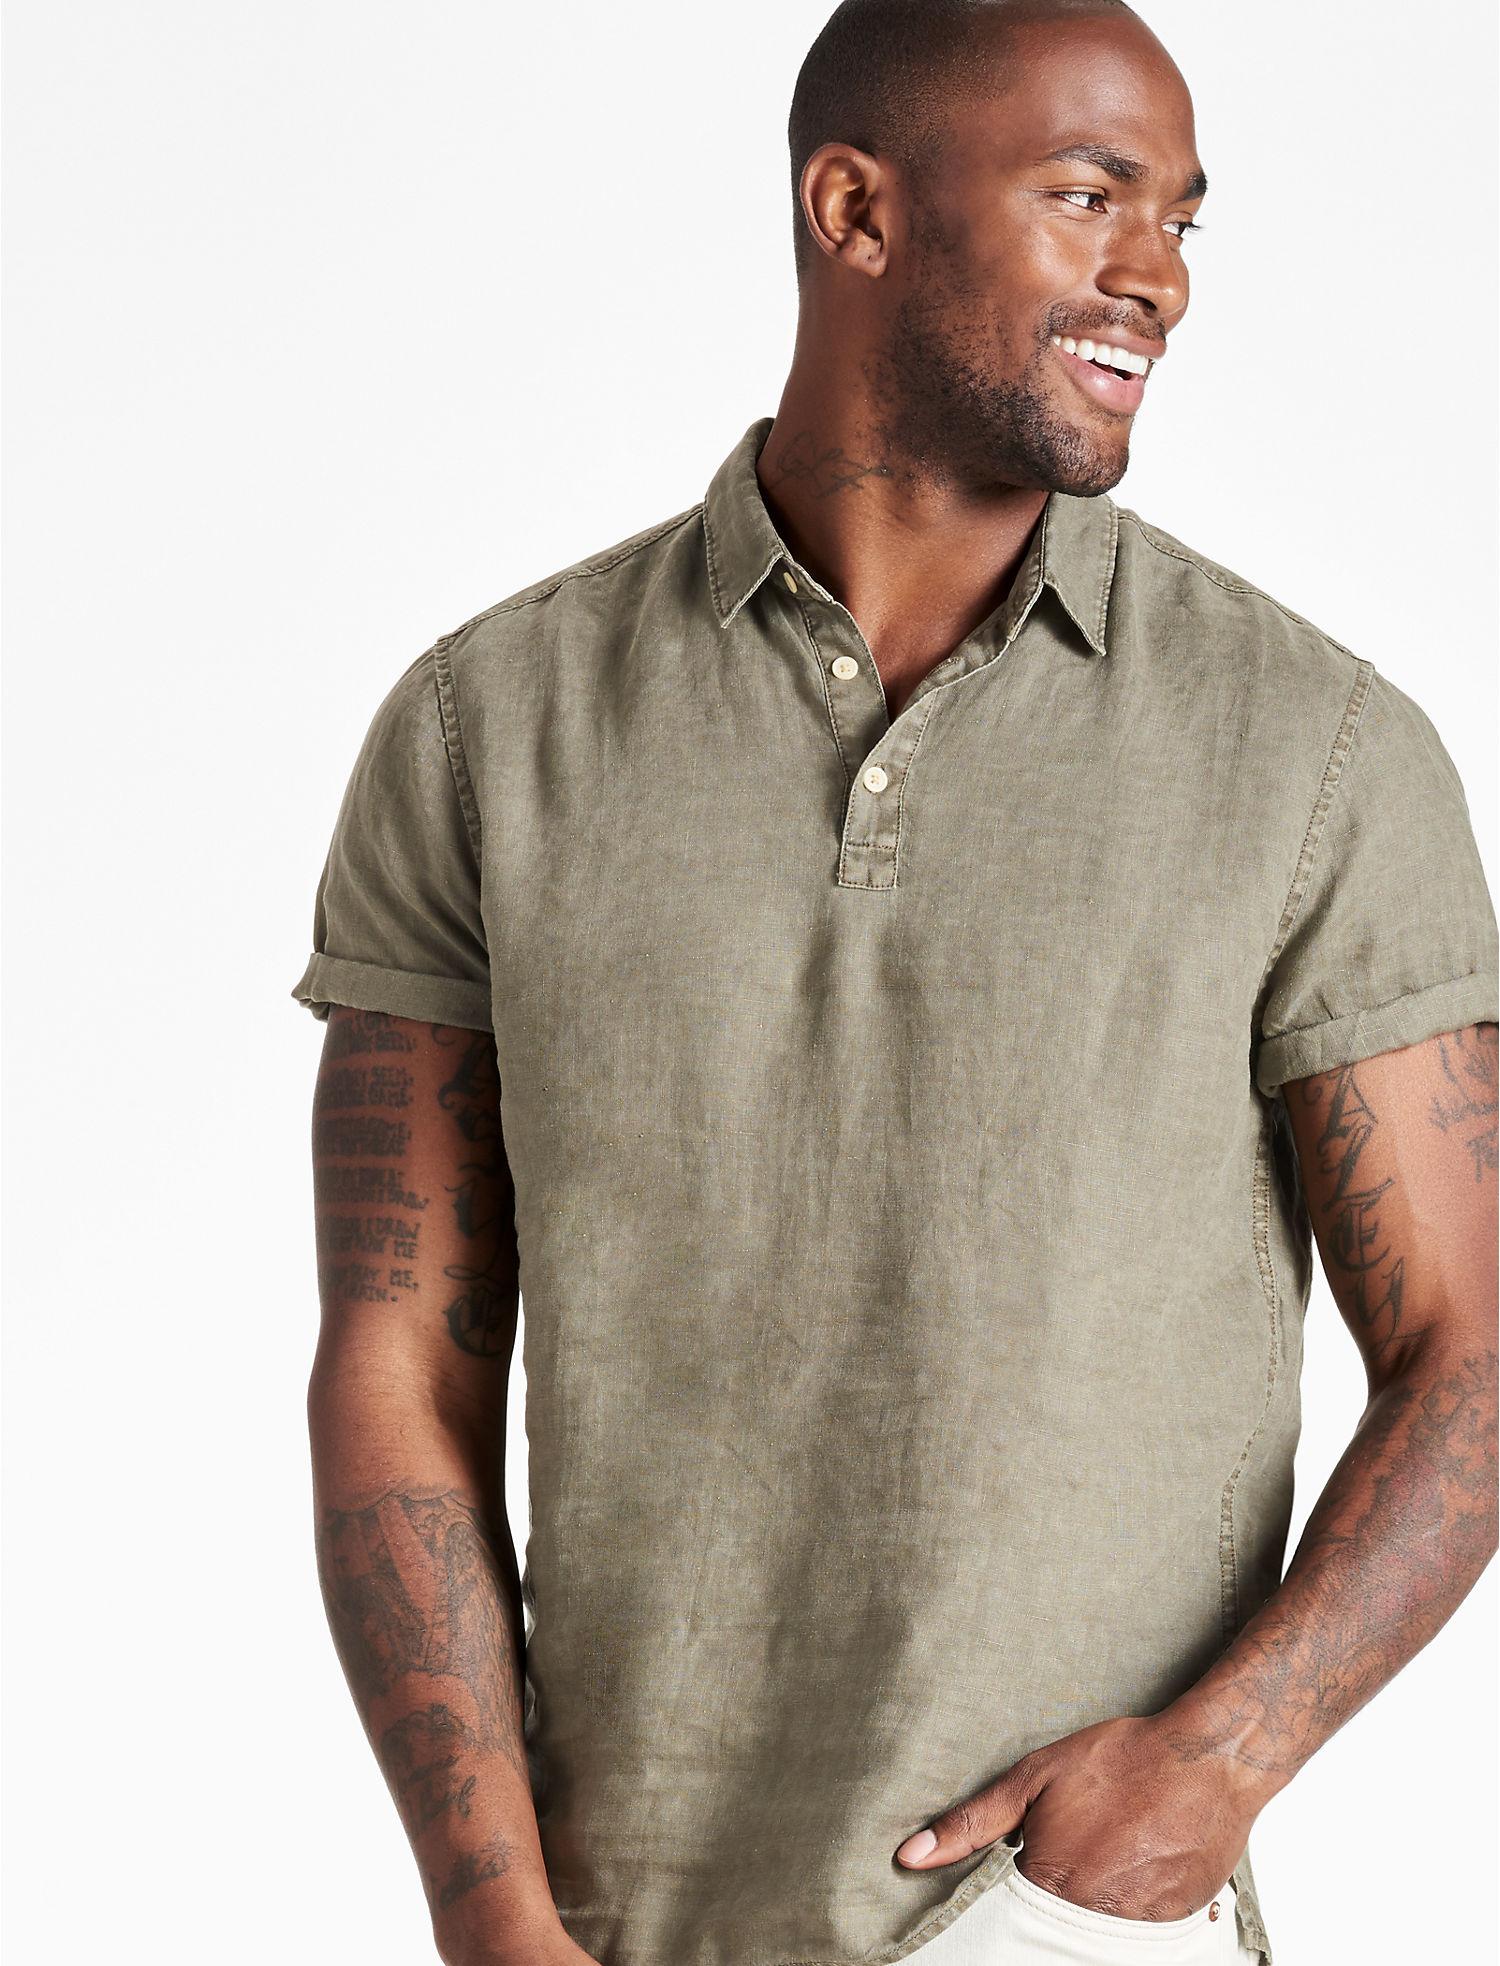 Us Polo Premium Linen Shirts Bcd Tofu House